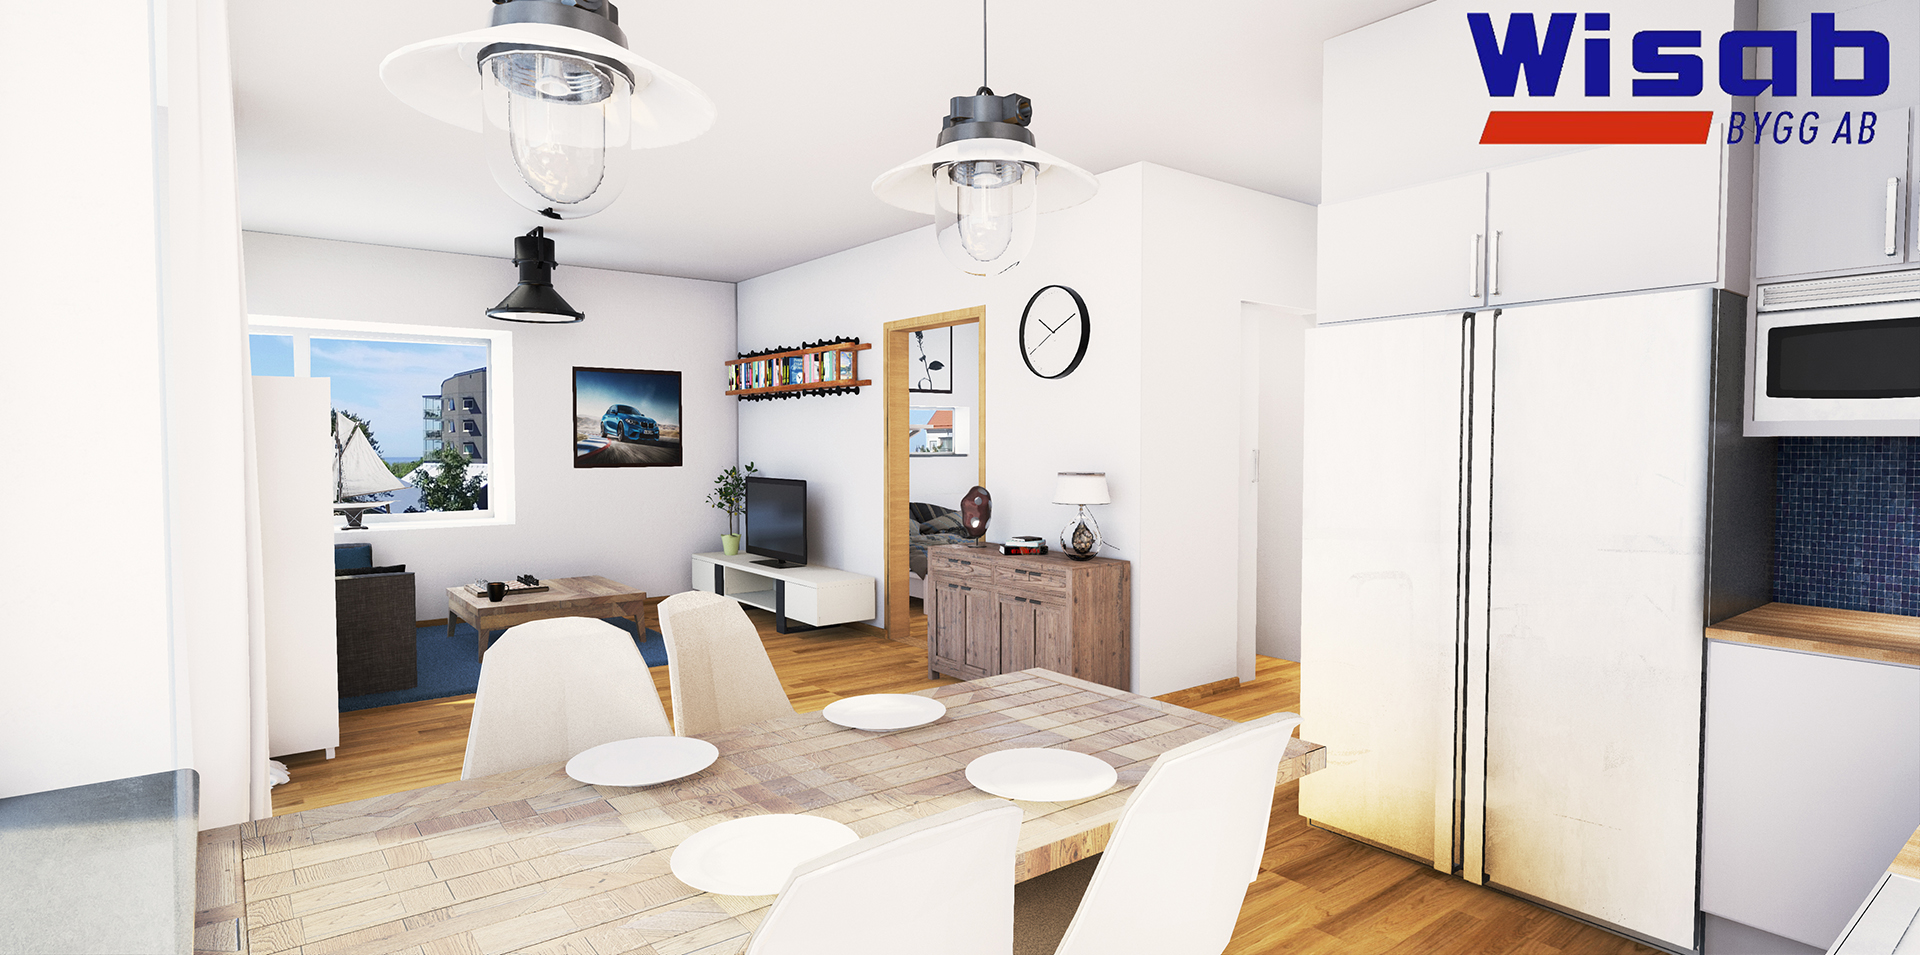 Wisab » två rum & kök bilder